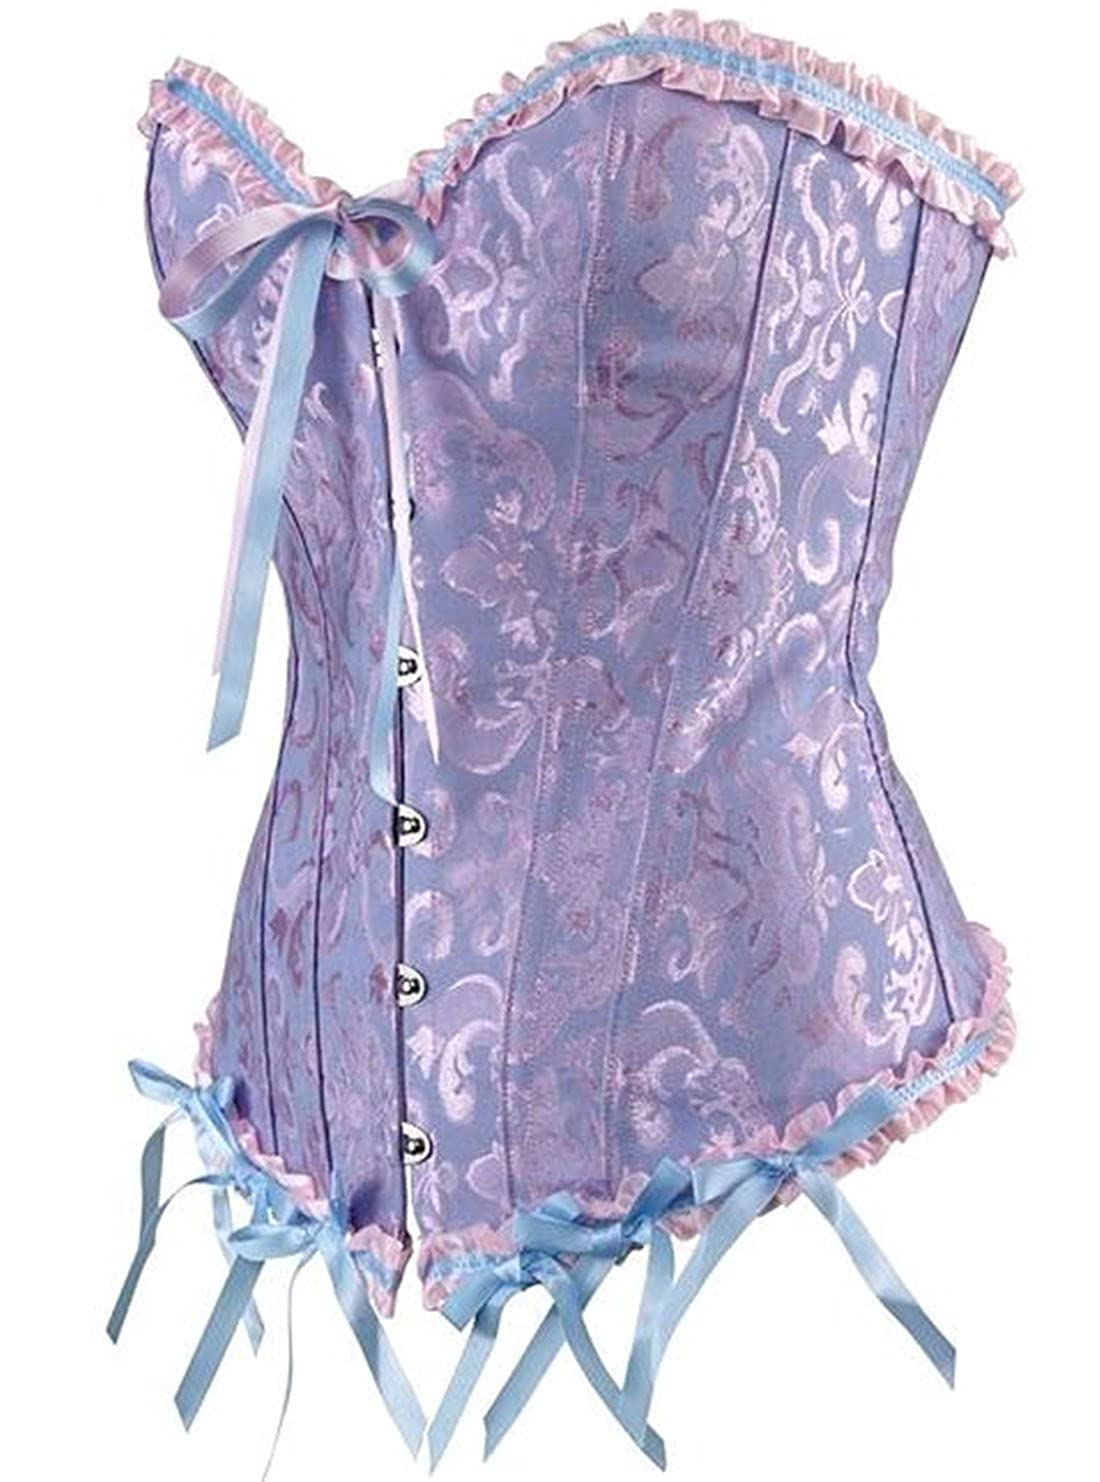 C2U Women Corset Plus Size Bustier Satin Overbust Lace Boned Top Waist Cincher Bodyshaper